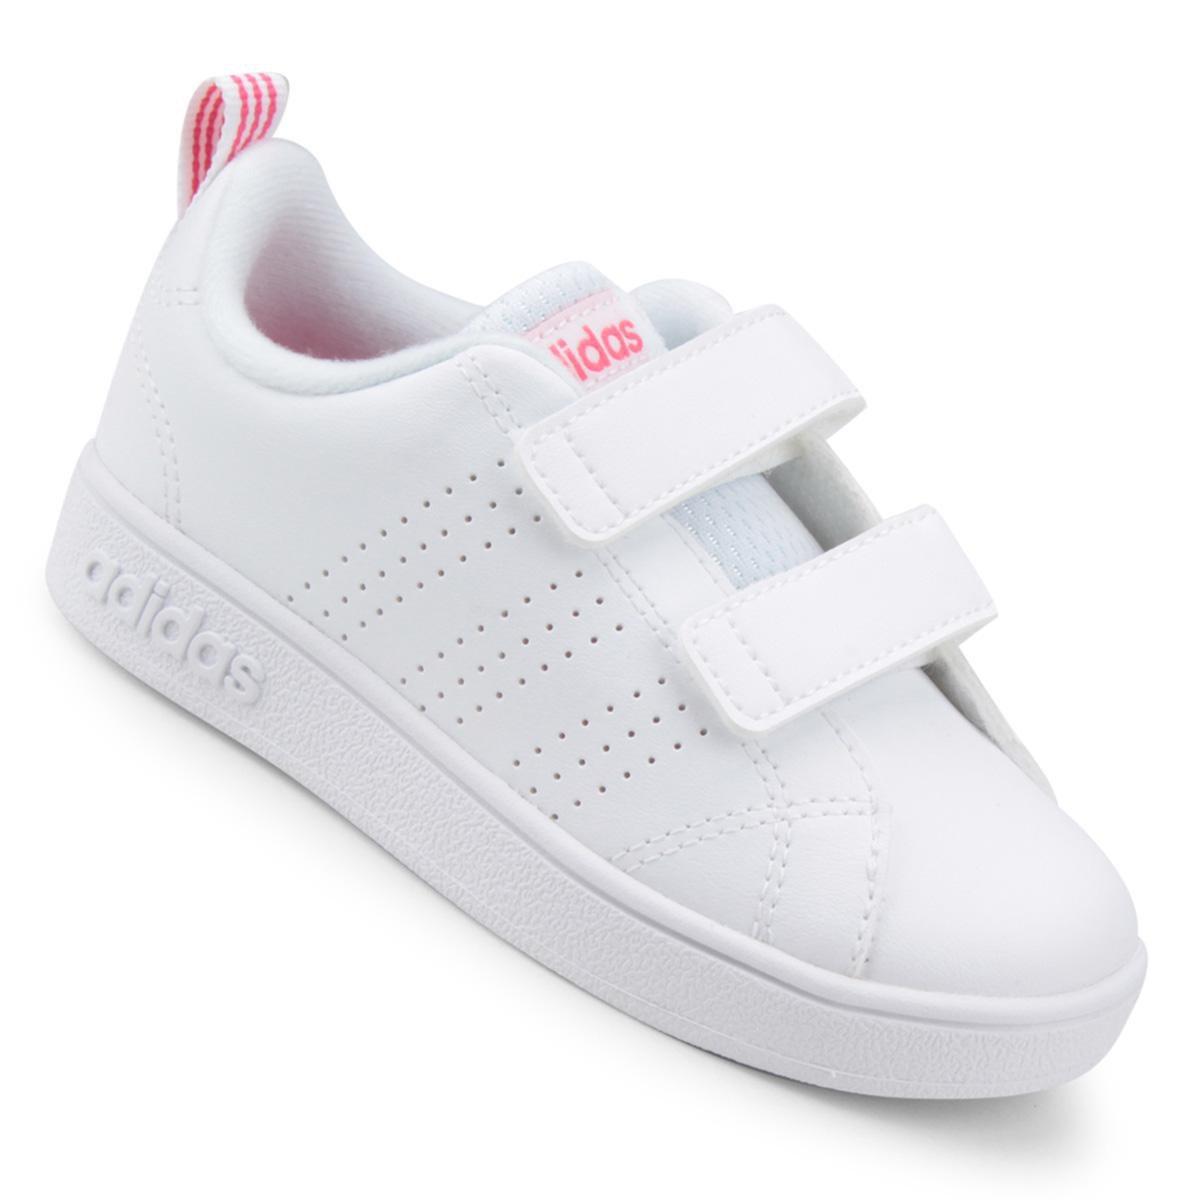 Tênis Infantil Adidas Vs Advantage Clean - Branco e Rosa - Compre Agora  b3d4f067ad0